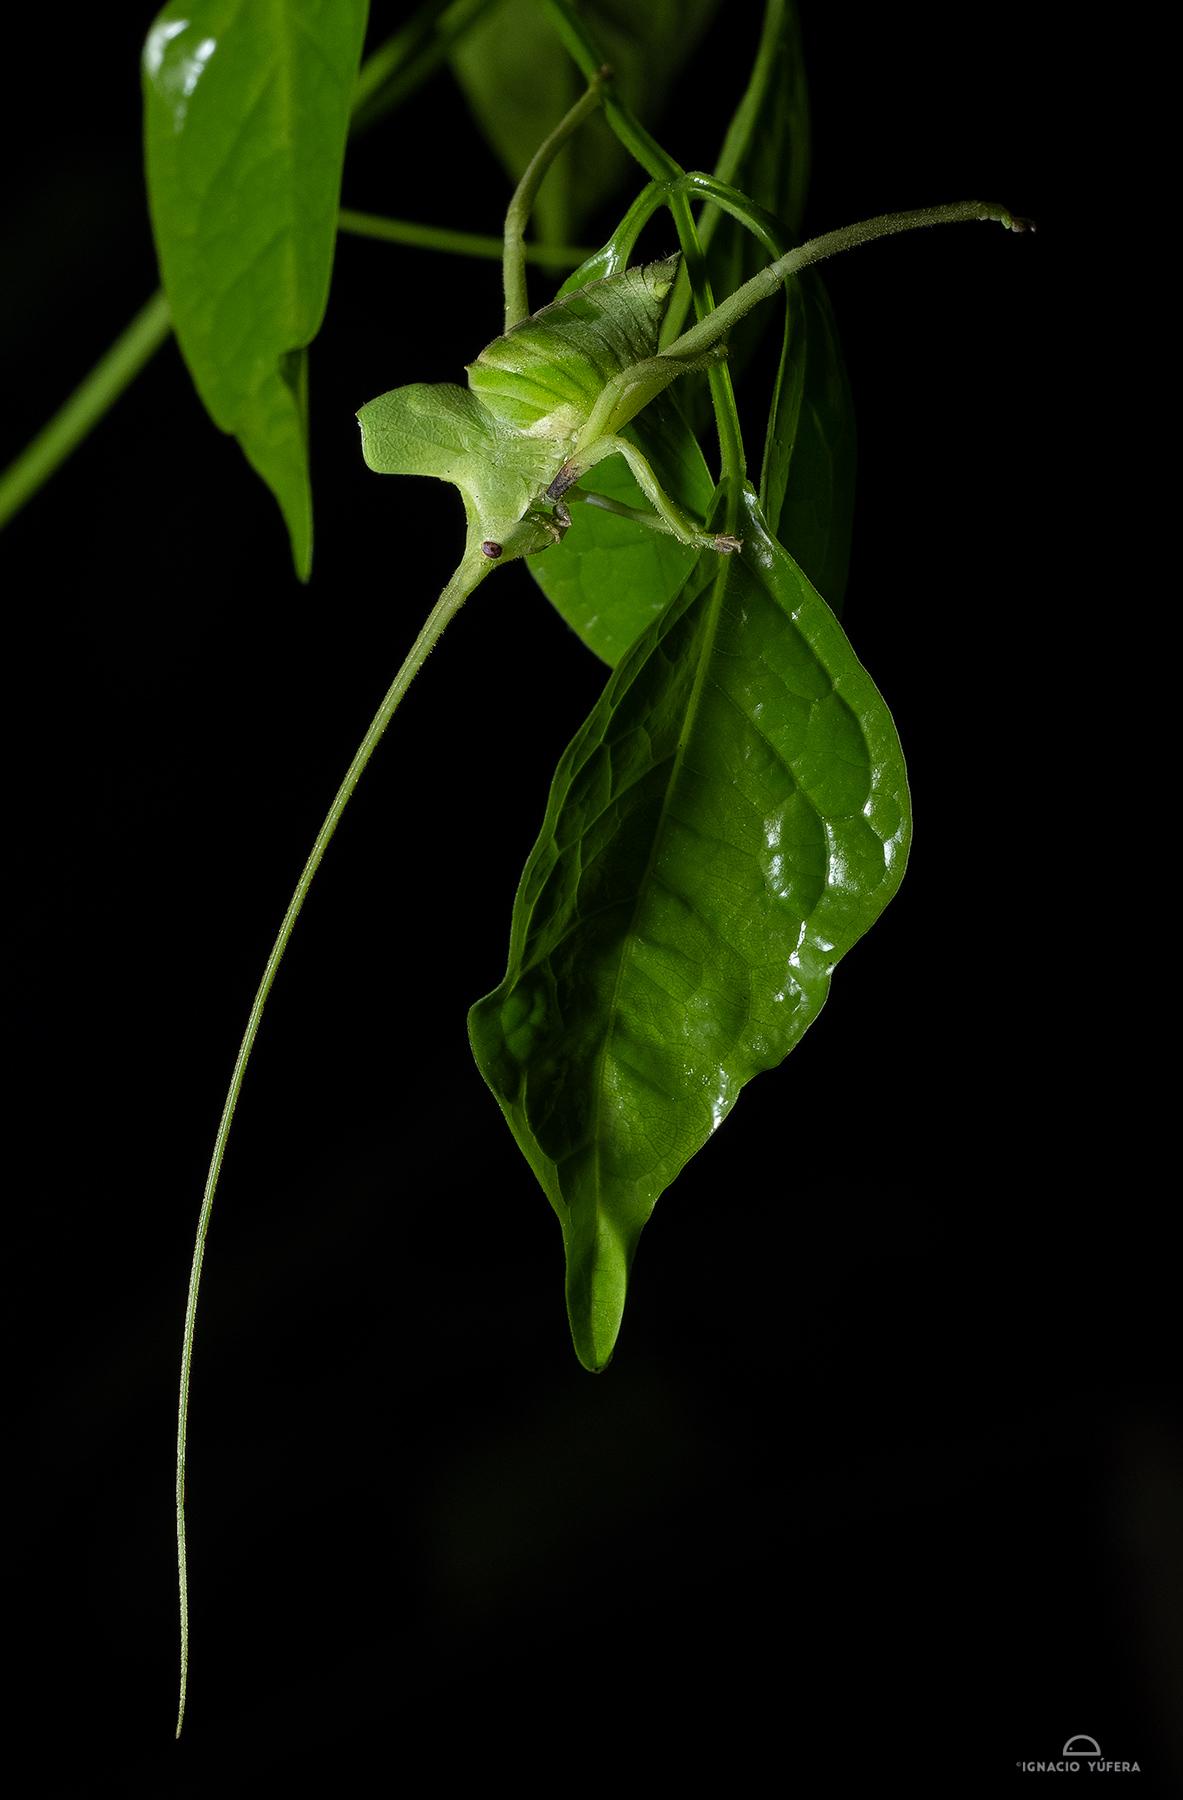 Long-horned katydid (Roxelana crassicornis), Madre de Dios, Peru